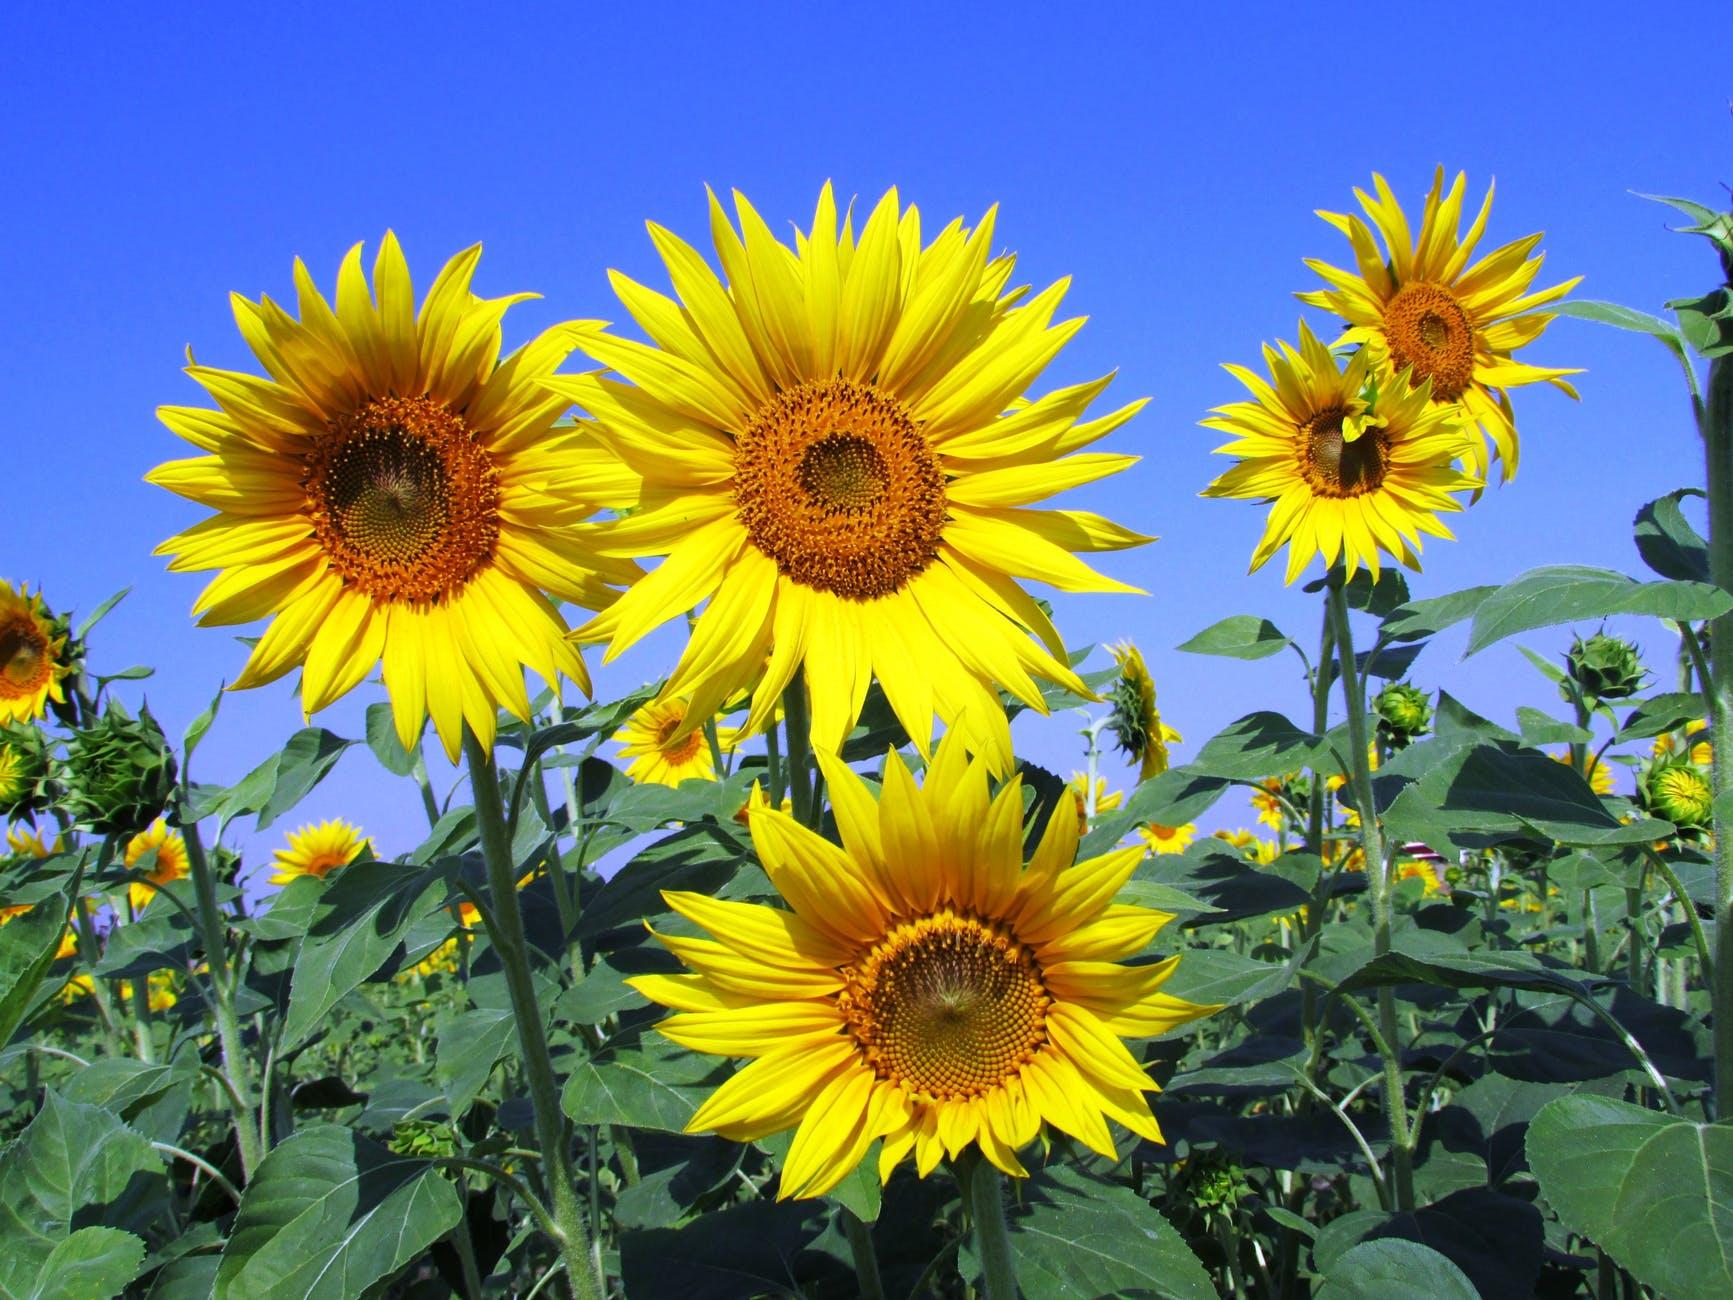 summer garden yellow petals